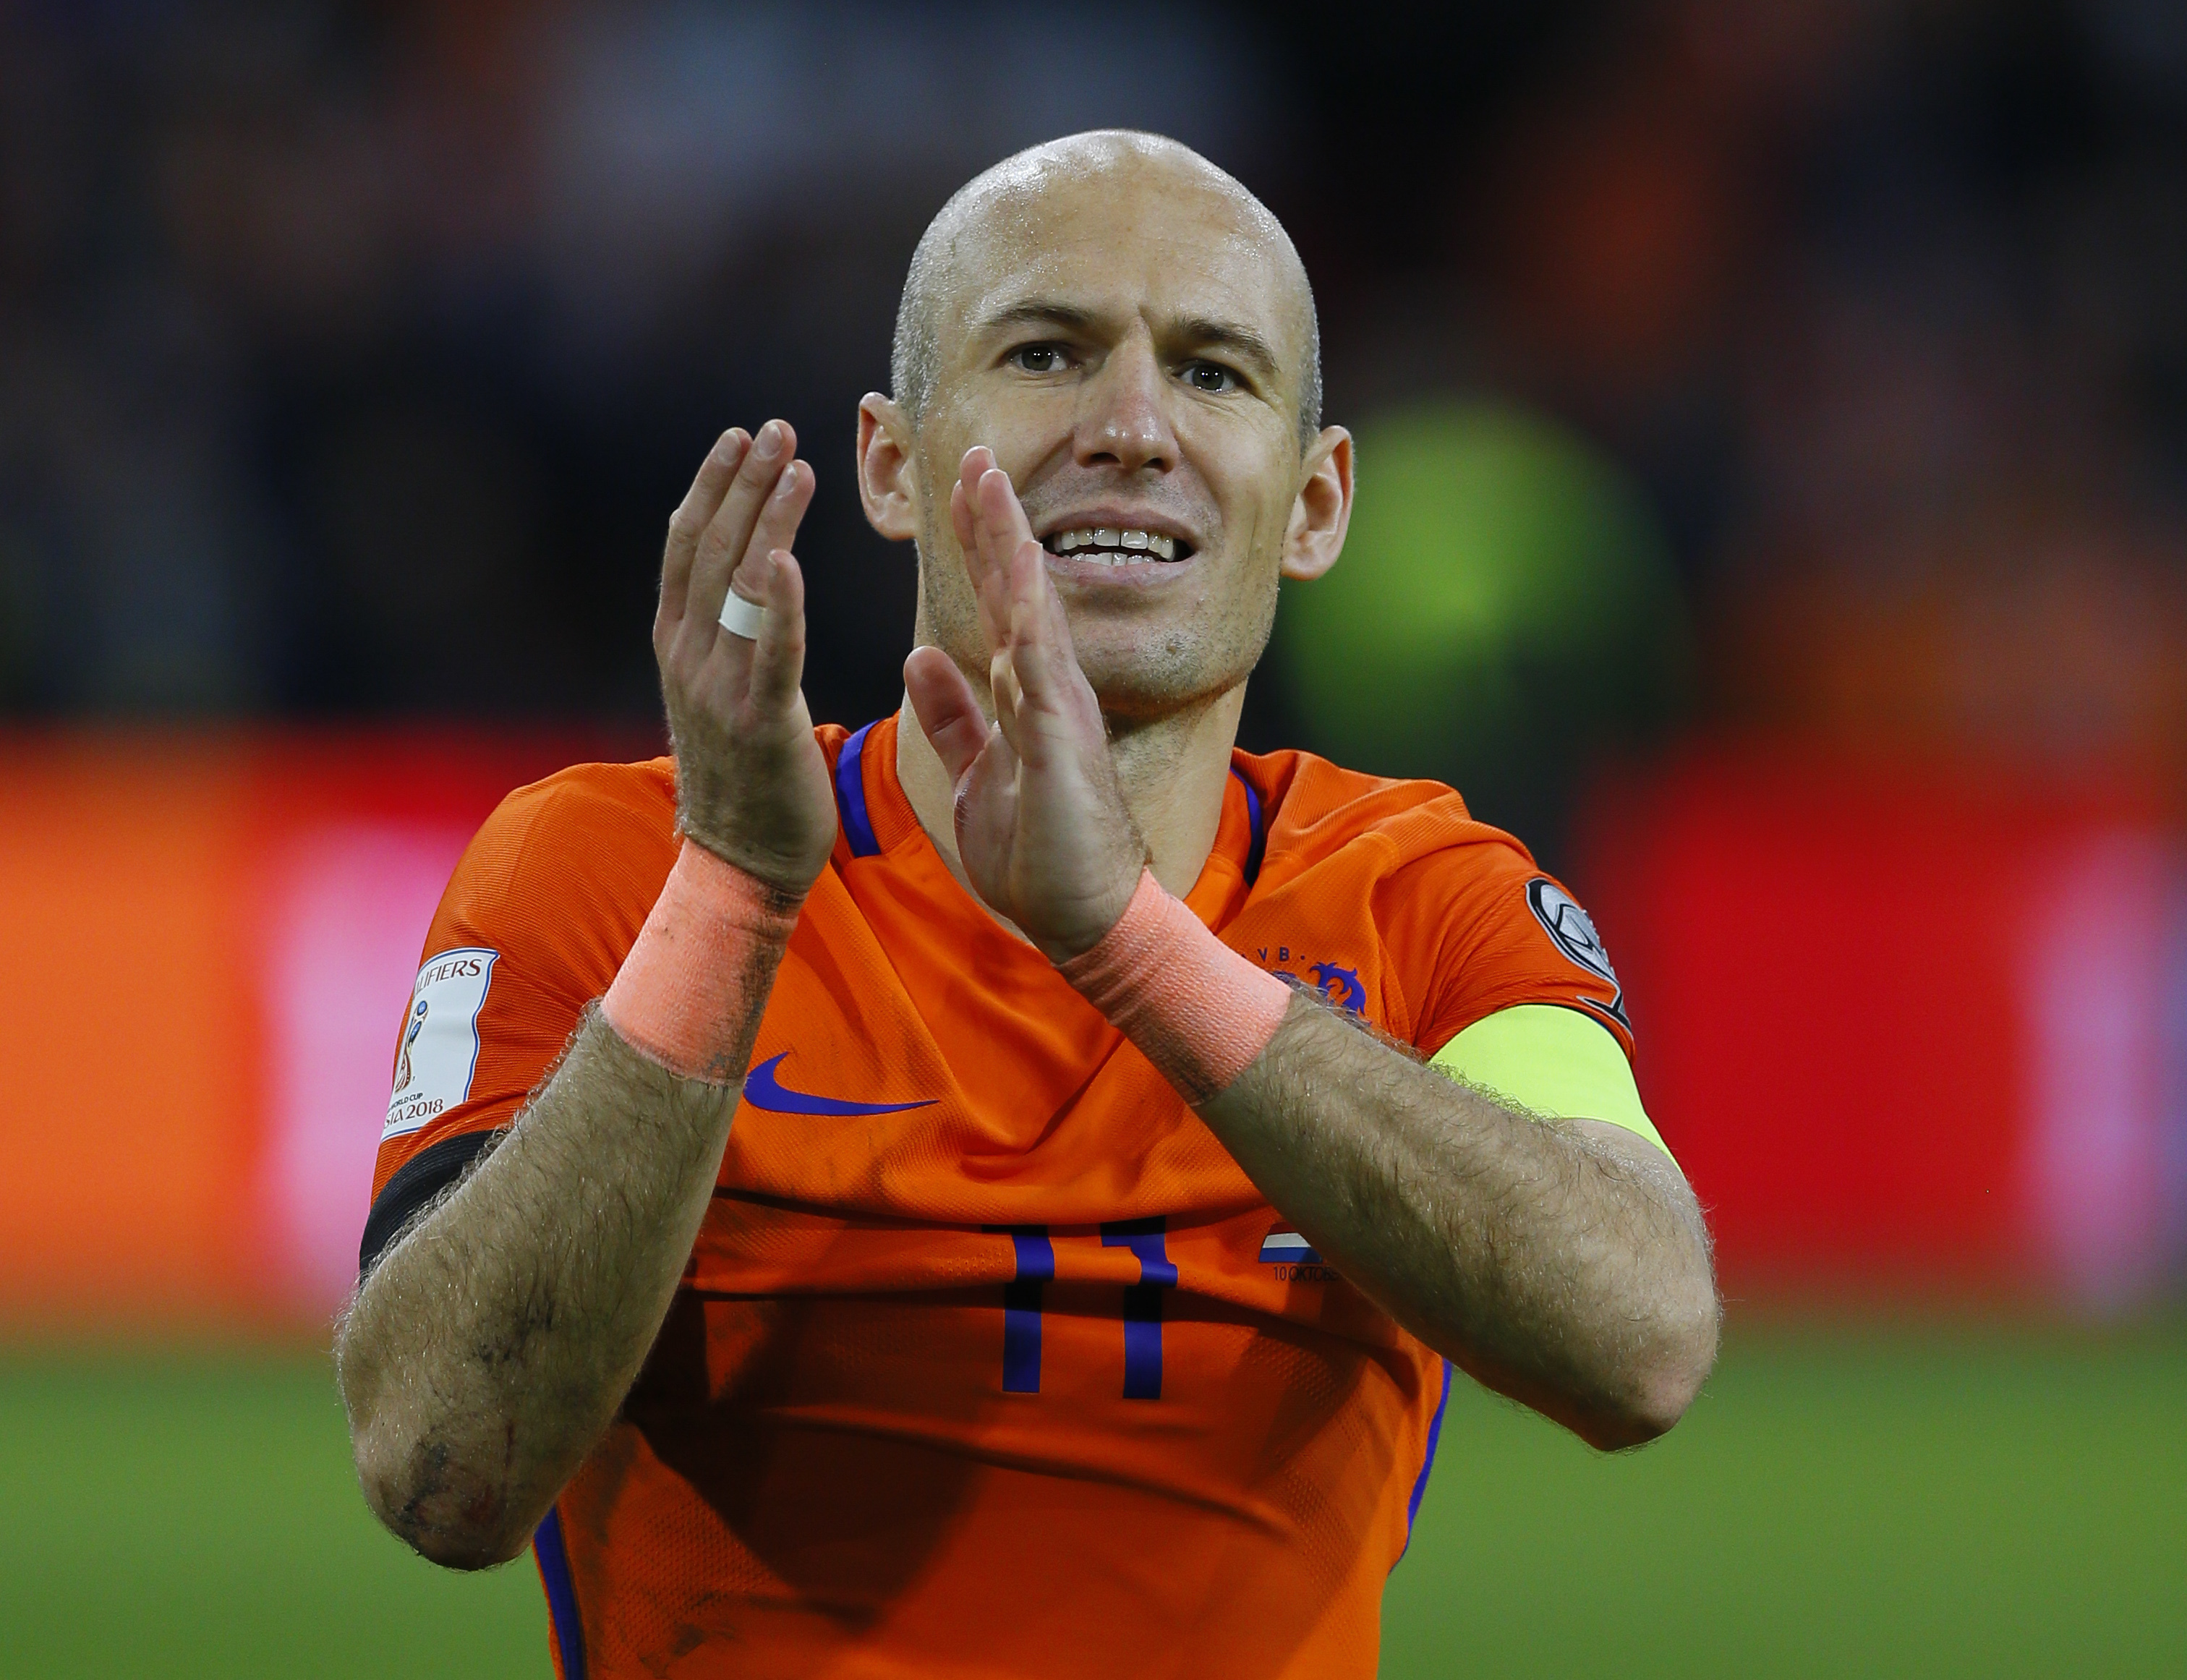 Arjen Robben在國家隊生涯最後一役攻進2球,但荷蘭還是無緣闖進世界盃會內賽。(達志影像)